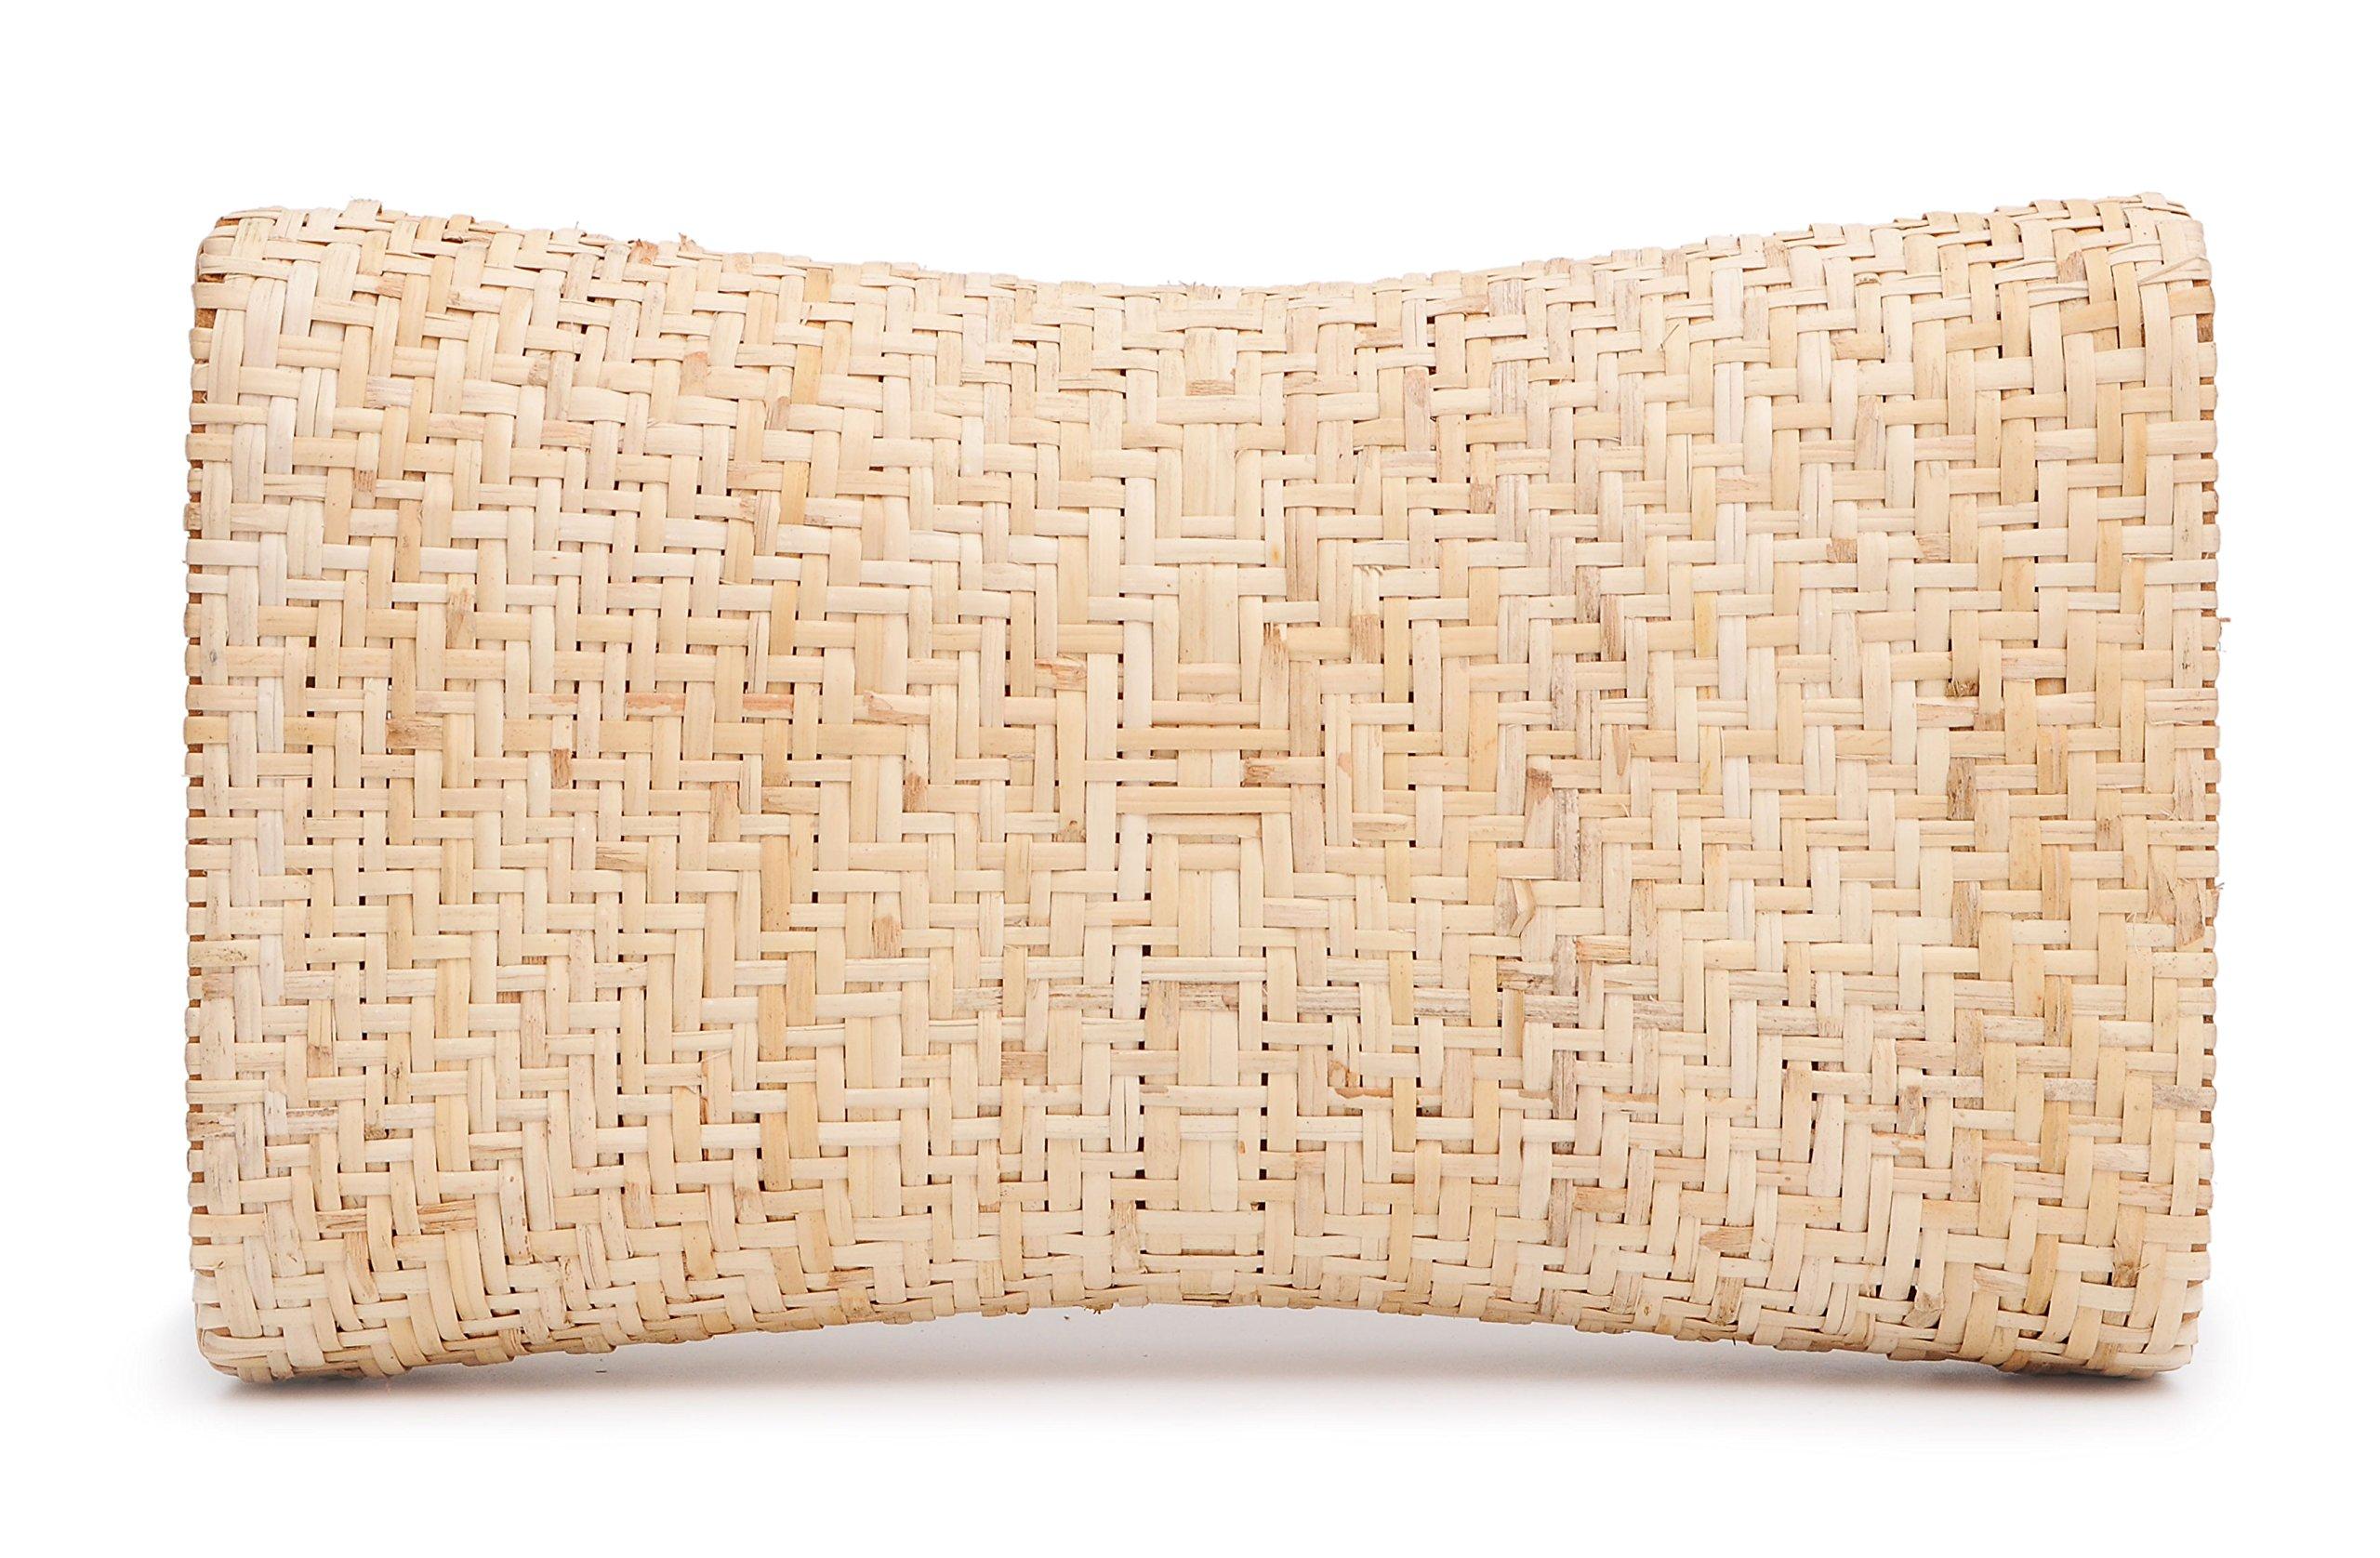 Vietnamese Natural Handmade Rattan Pillow- Helping Maintain Health & Portable